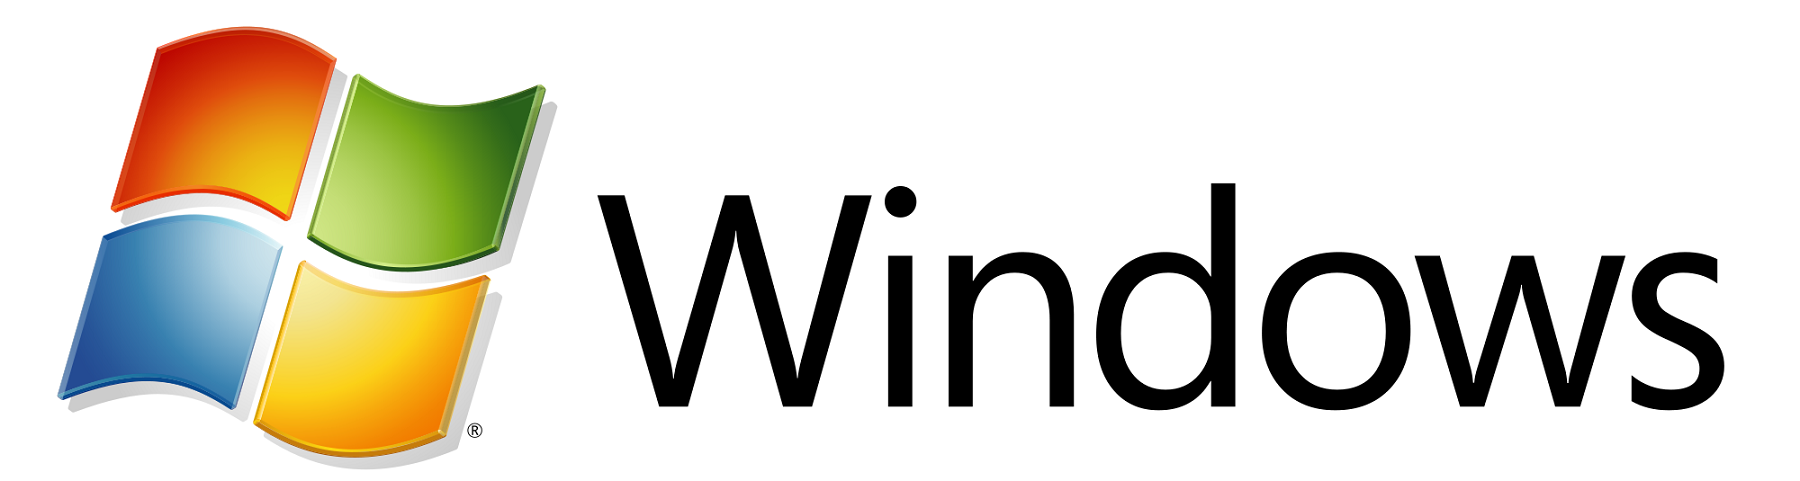 Microsoft Windows Logo PNG - 97802